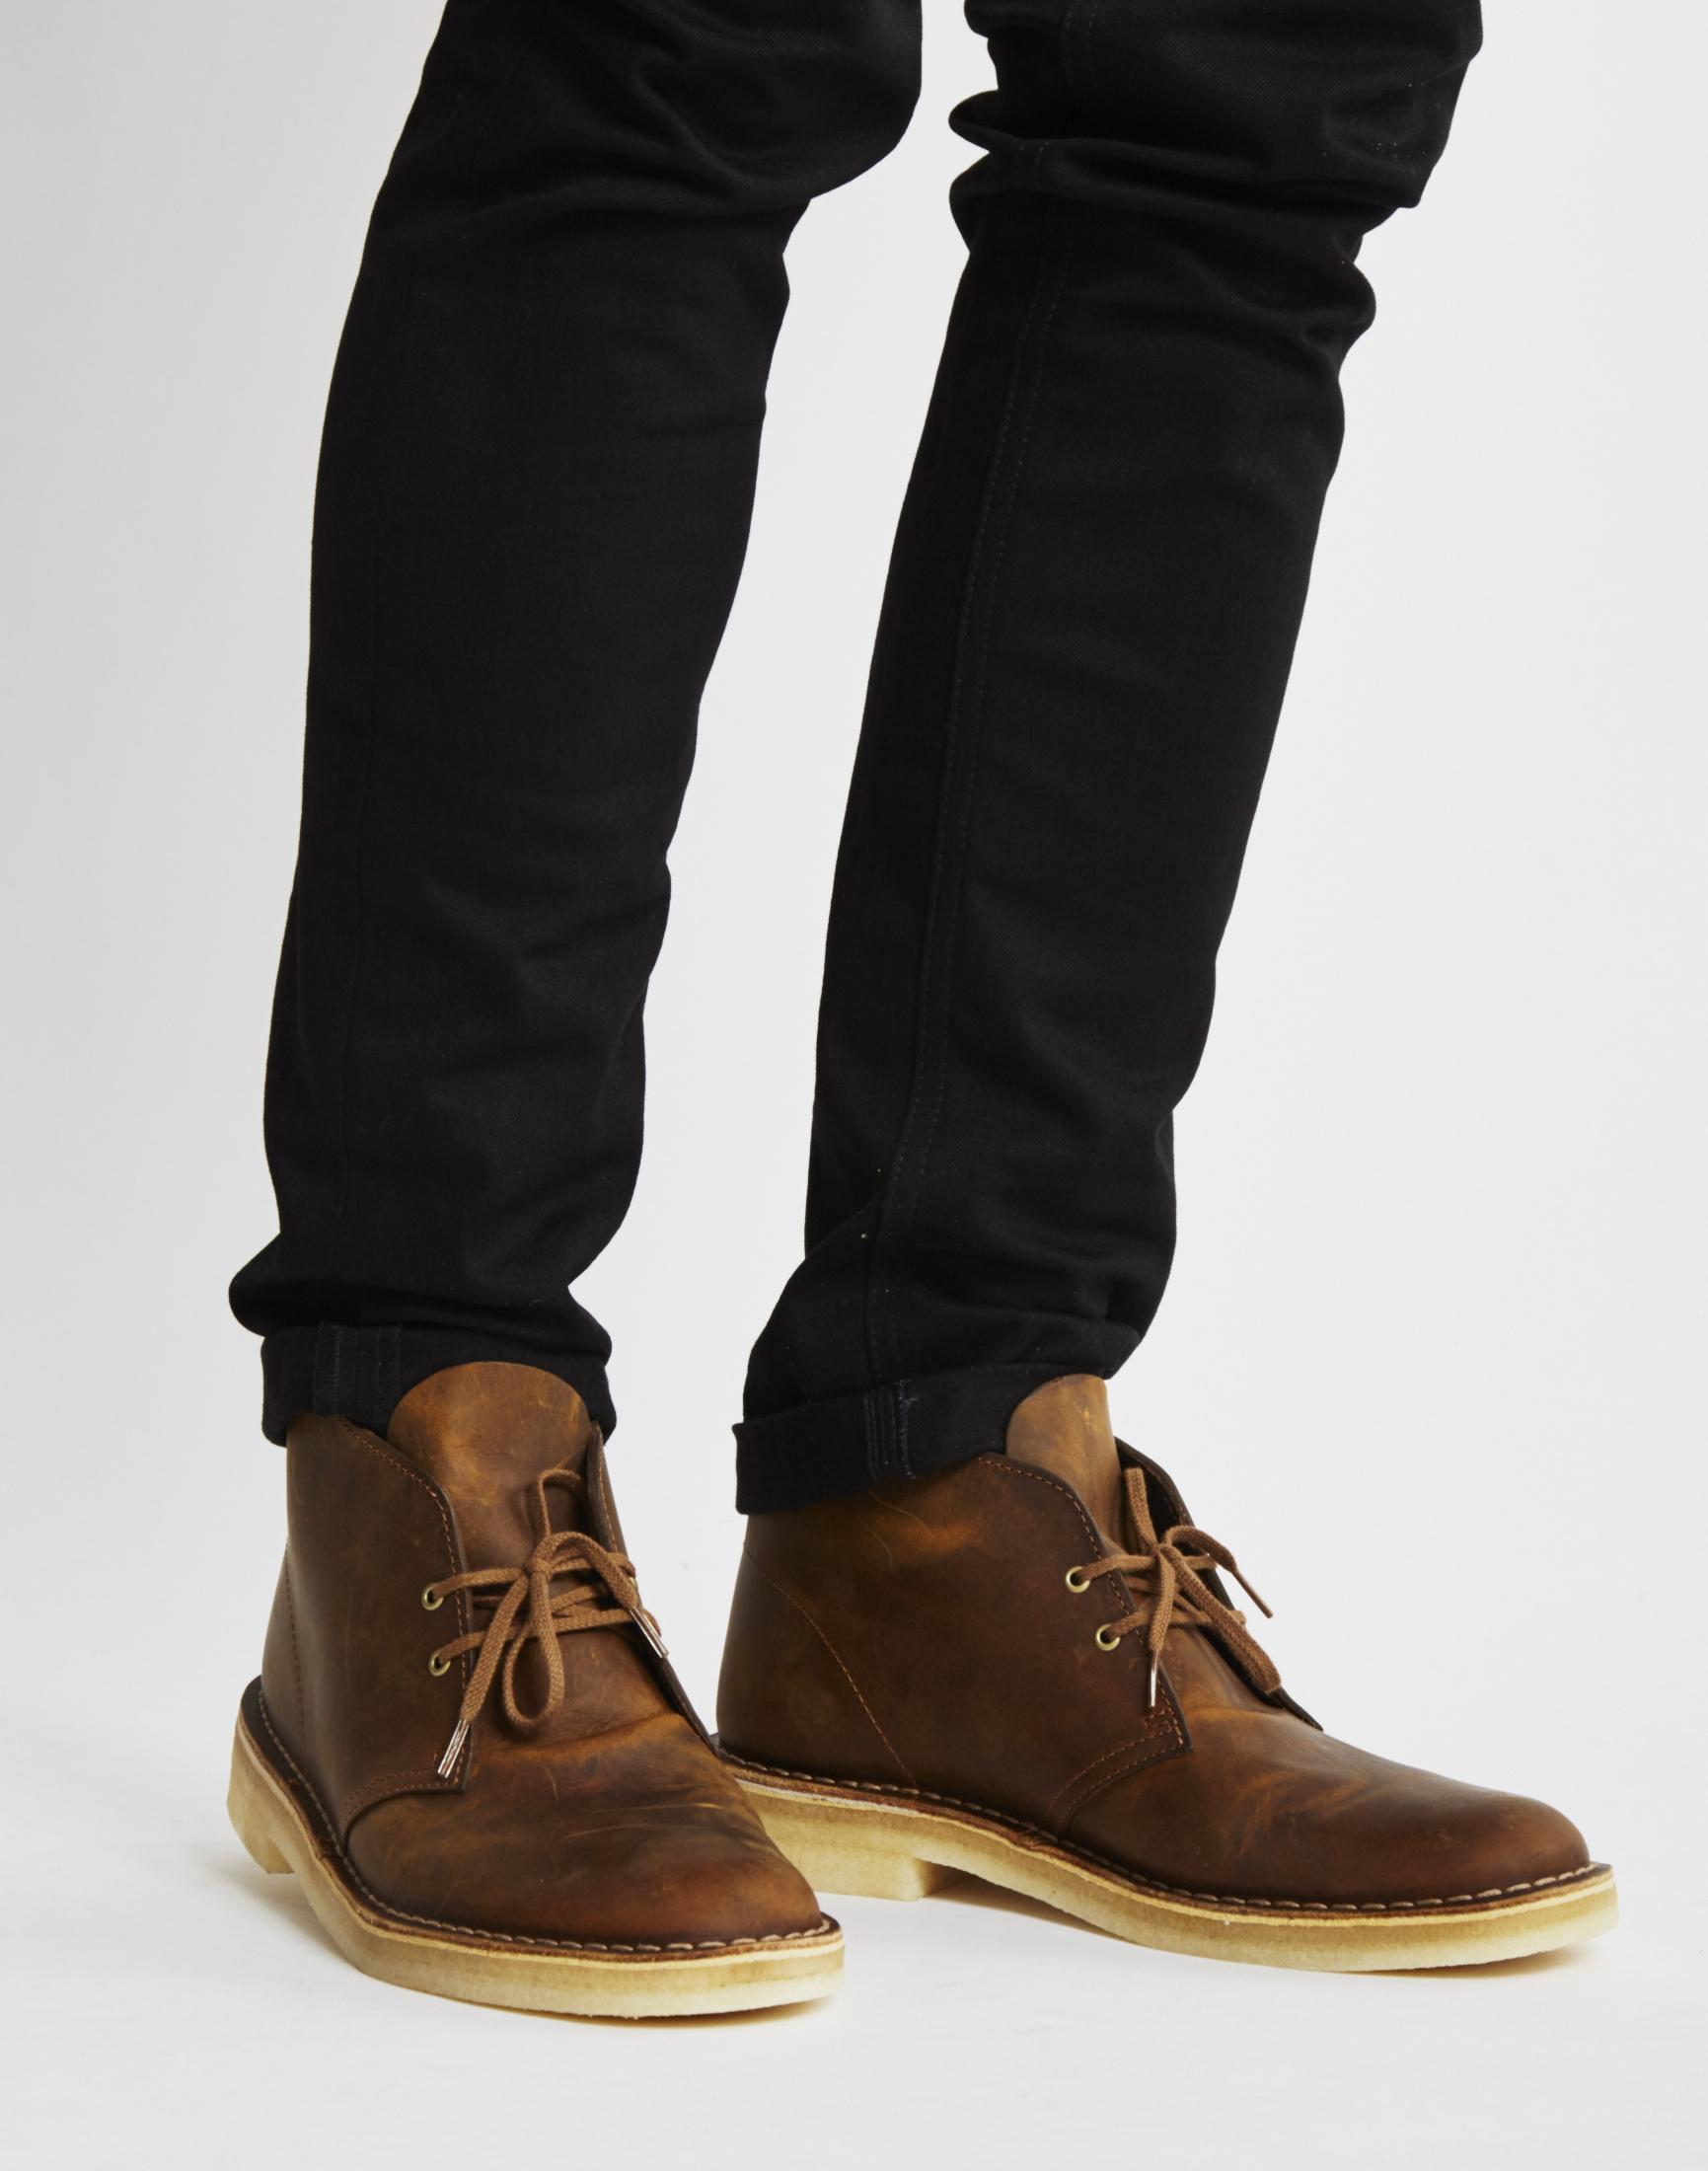 clarks originals brown suede desert shoes innovaide